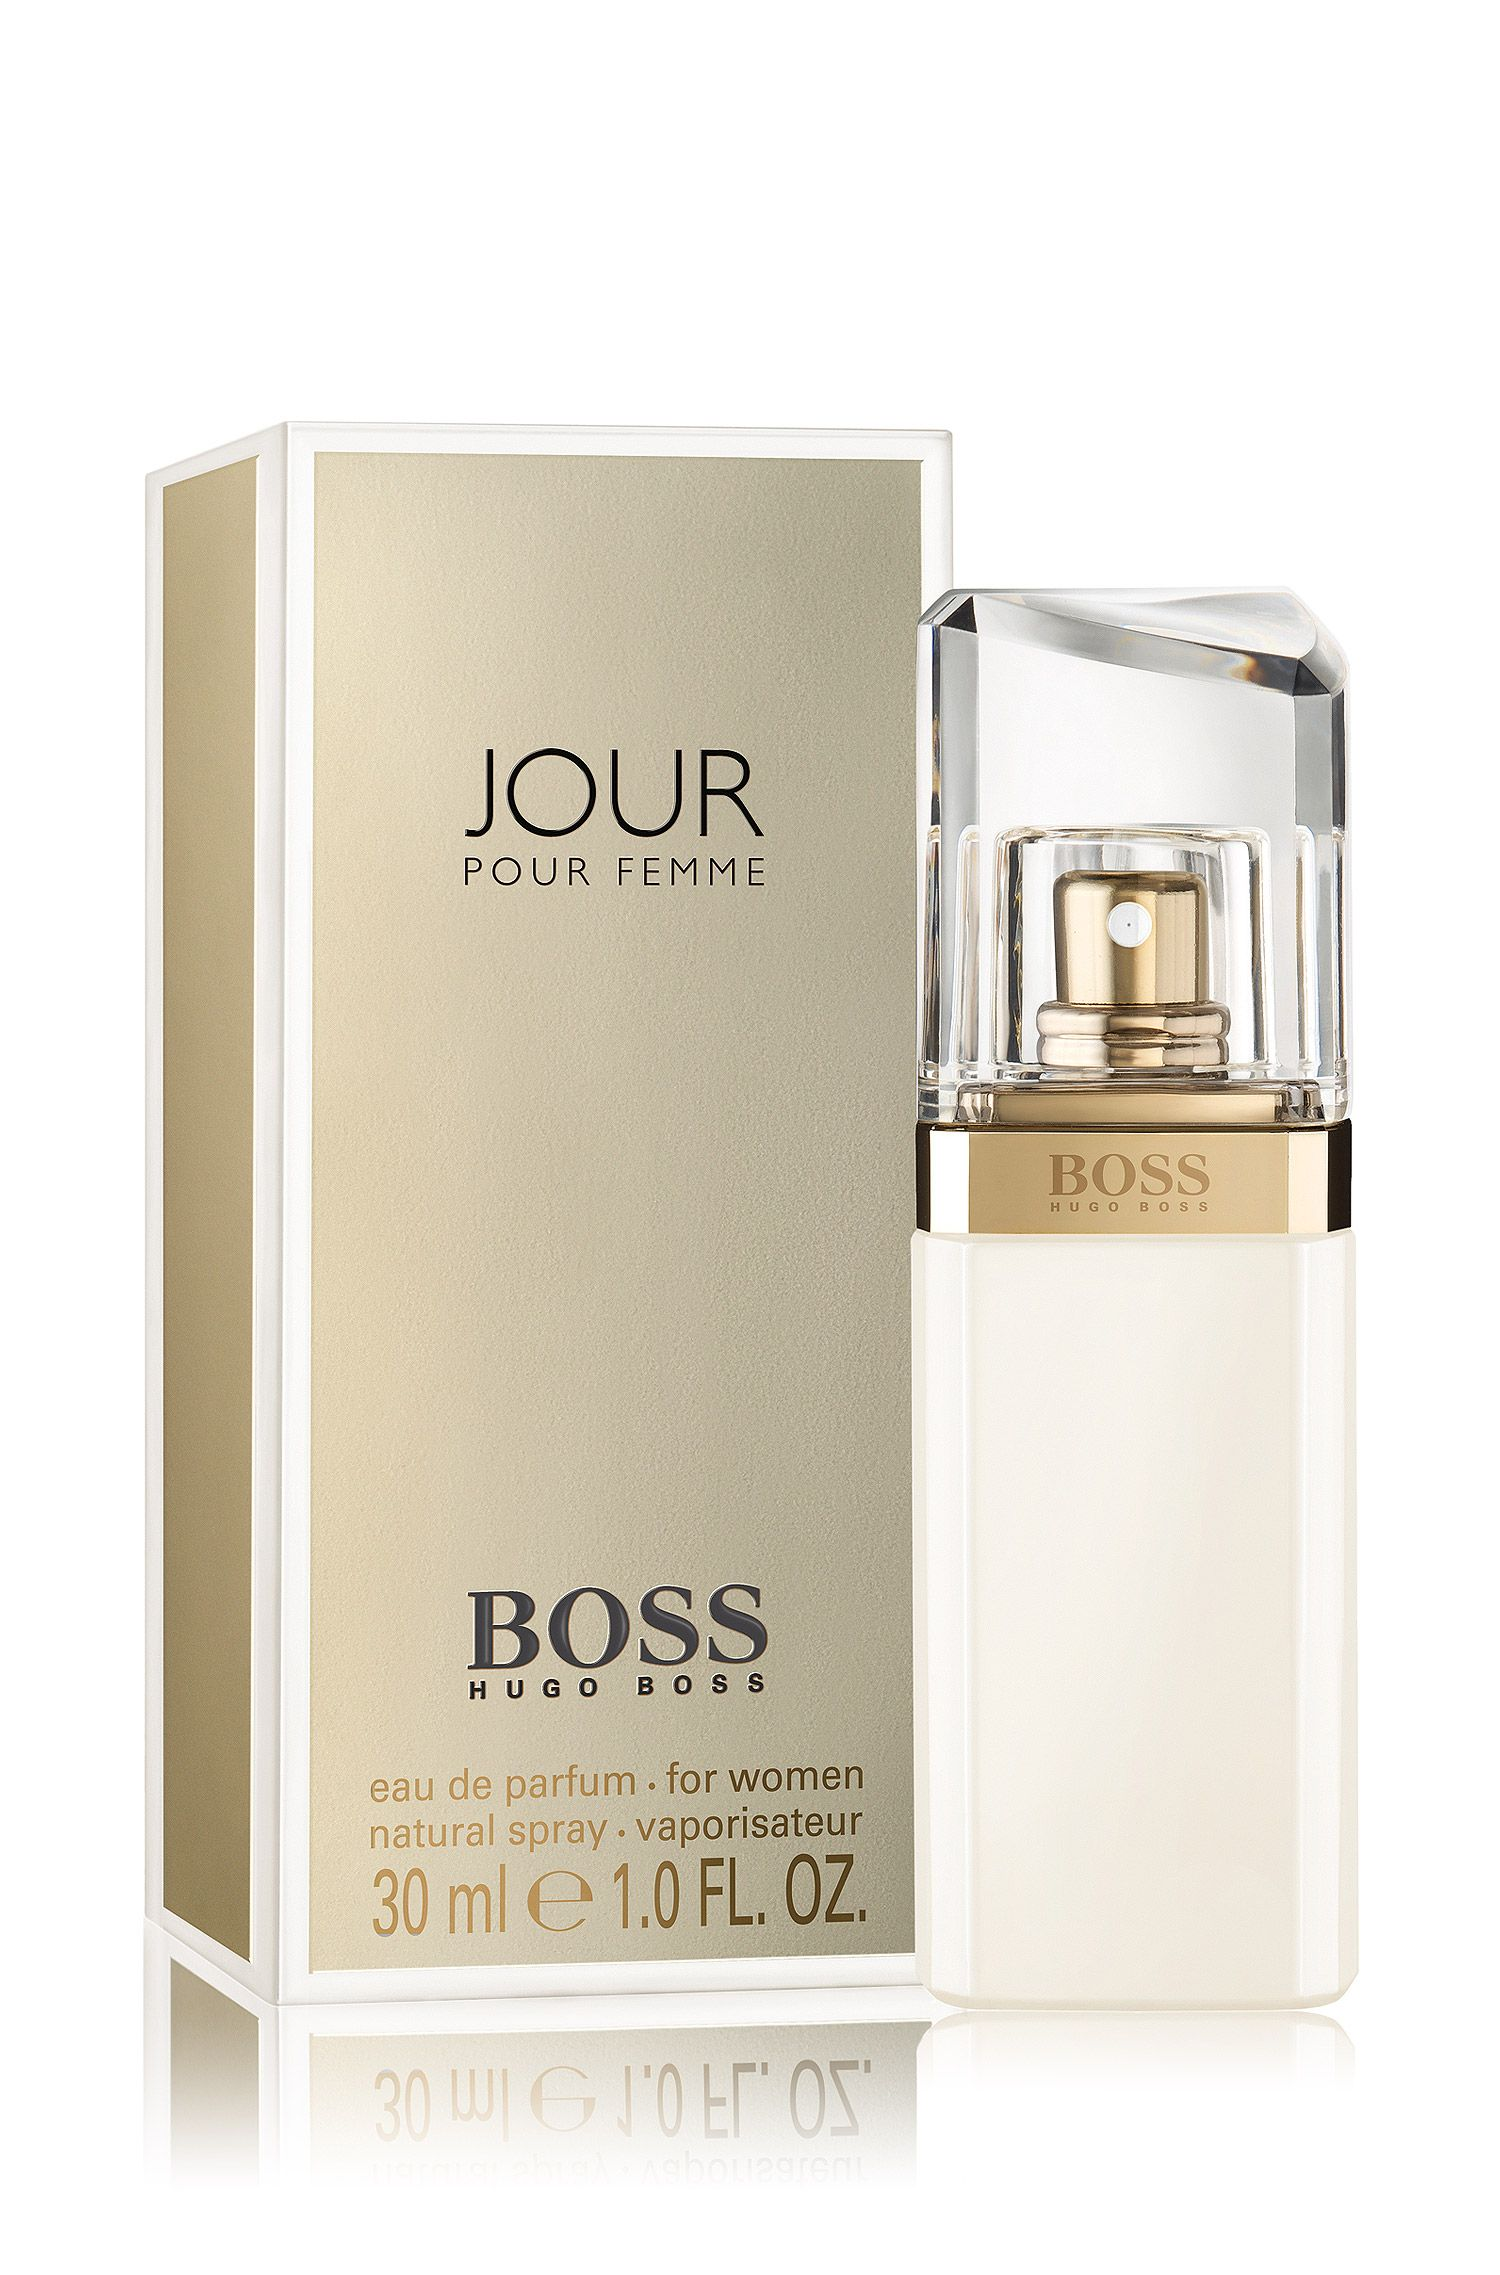 'BOSS Jour' Eau de Parfum 30 ml